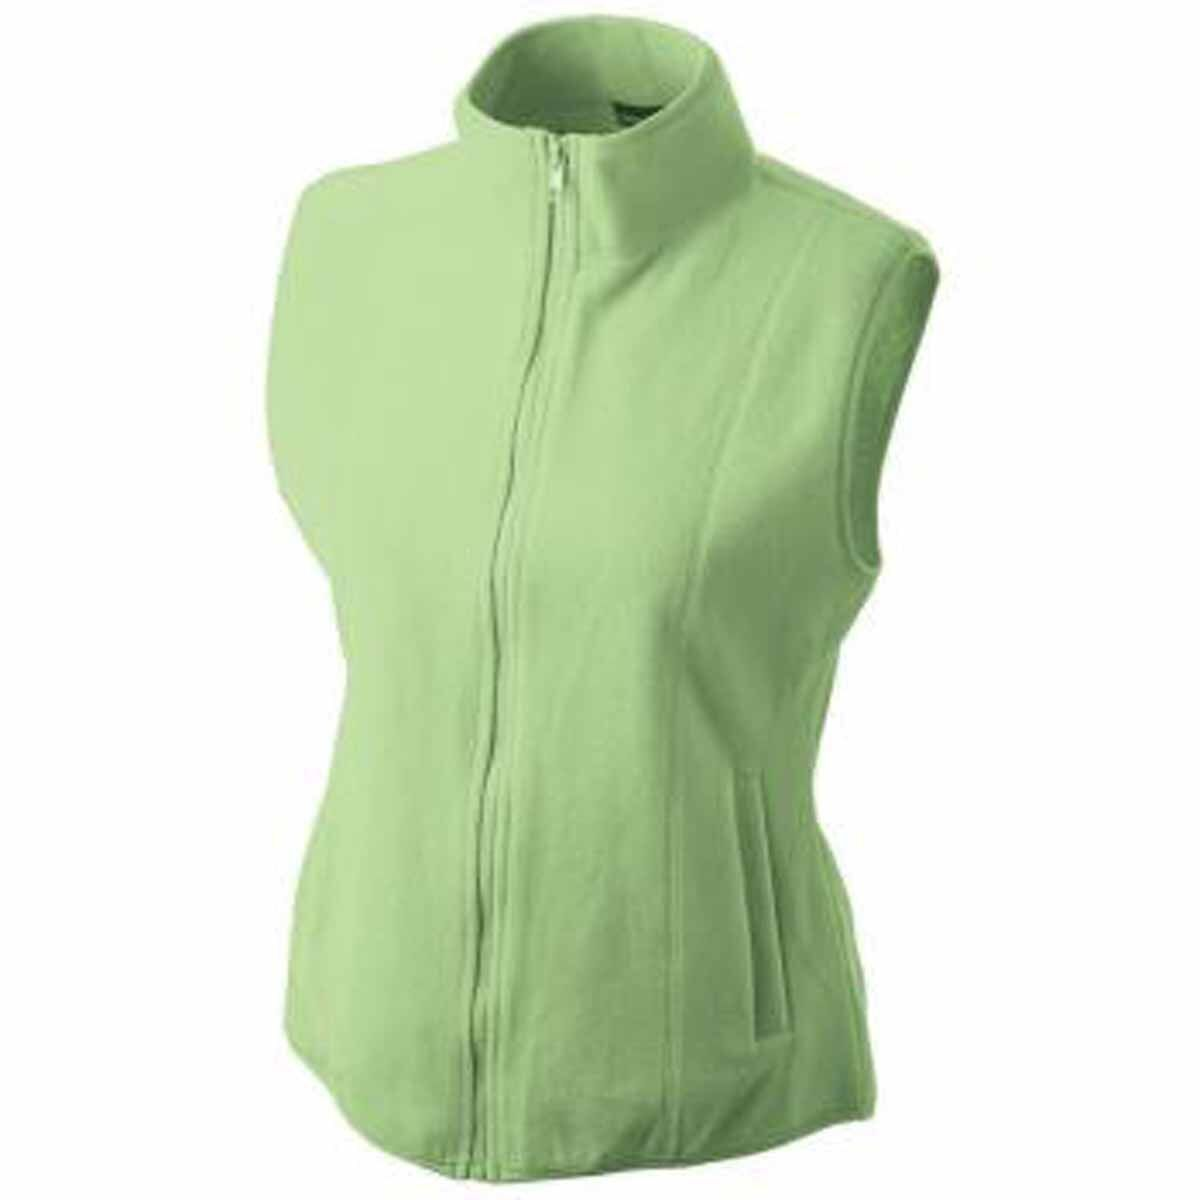 gilet sans manches bodywarmer polaire femme jn048 vert. Black Bedroom Furniture Sets. Home Design Ideas